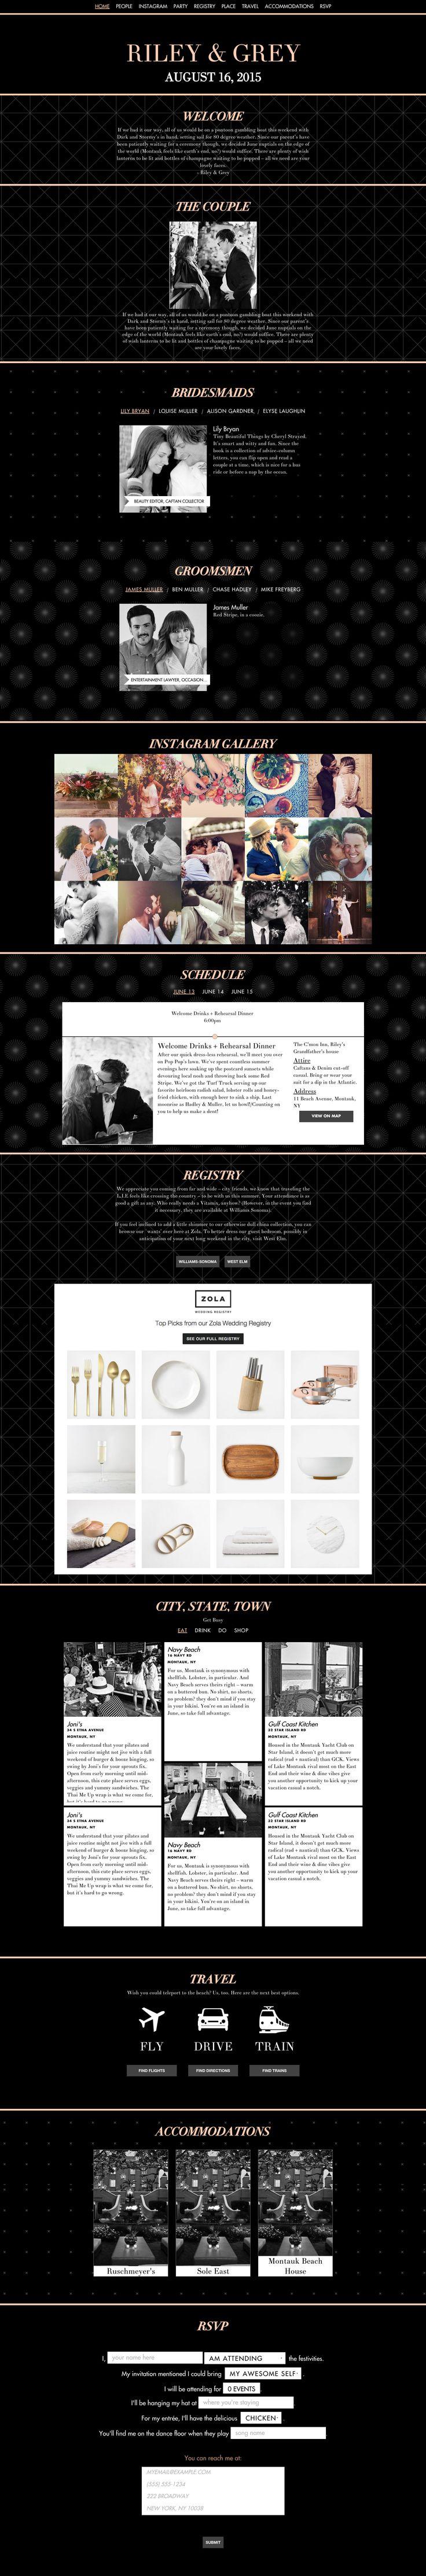 """Copper Tone"" black wedding website design by Riley & Grey (graphic design, wedding planning, wedding website example)"